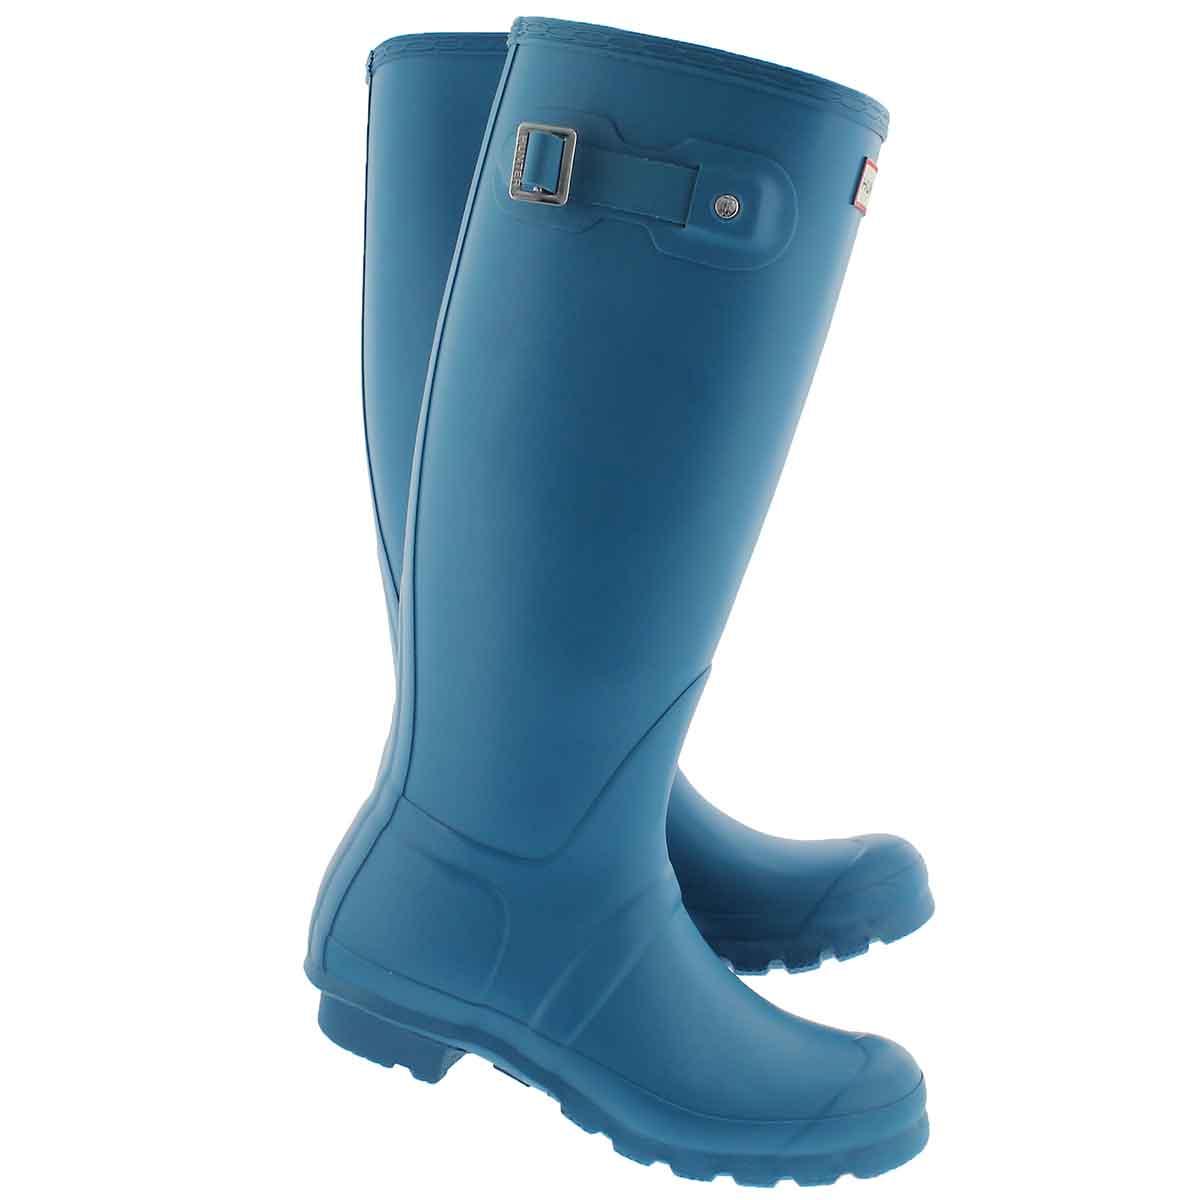 Lds Original Tall Classic blue rain boot